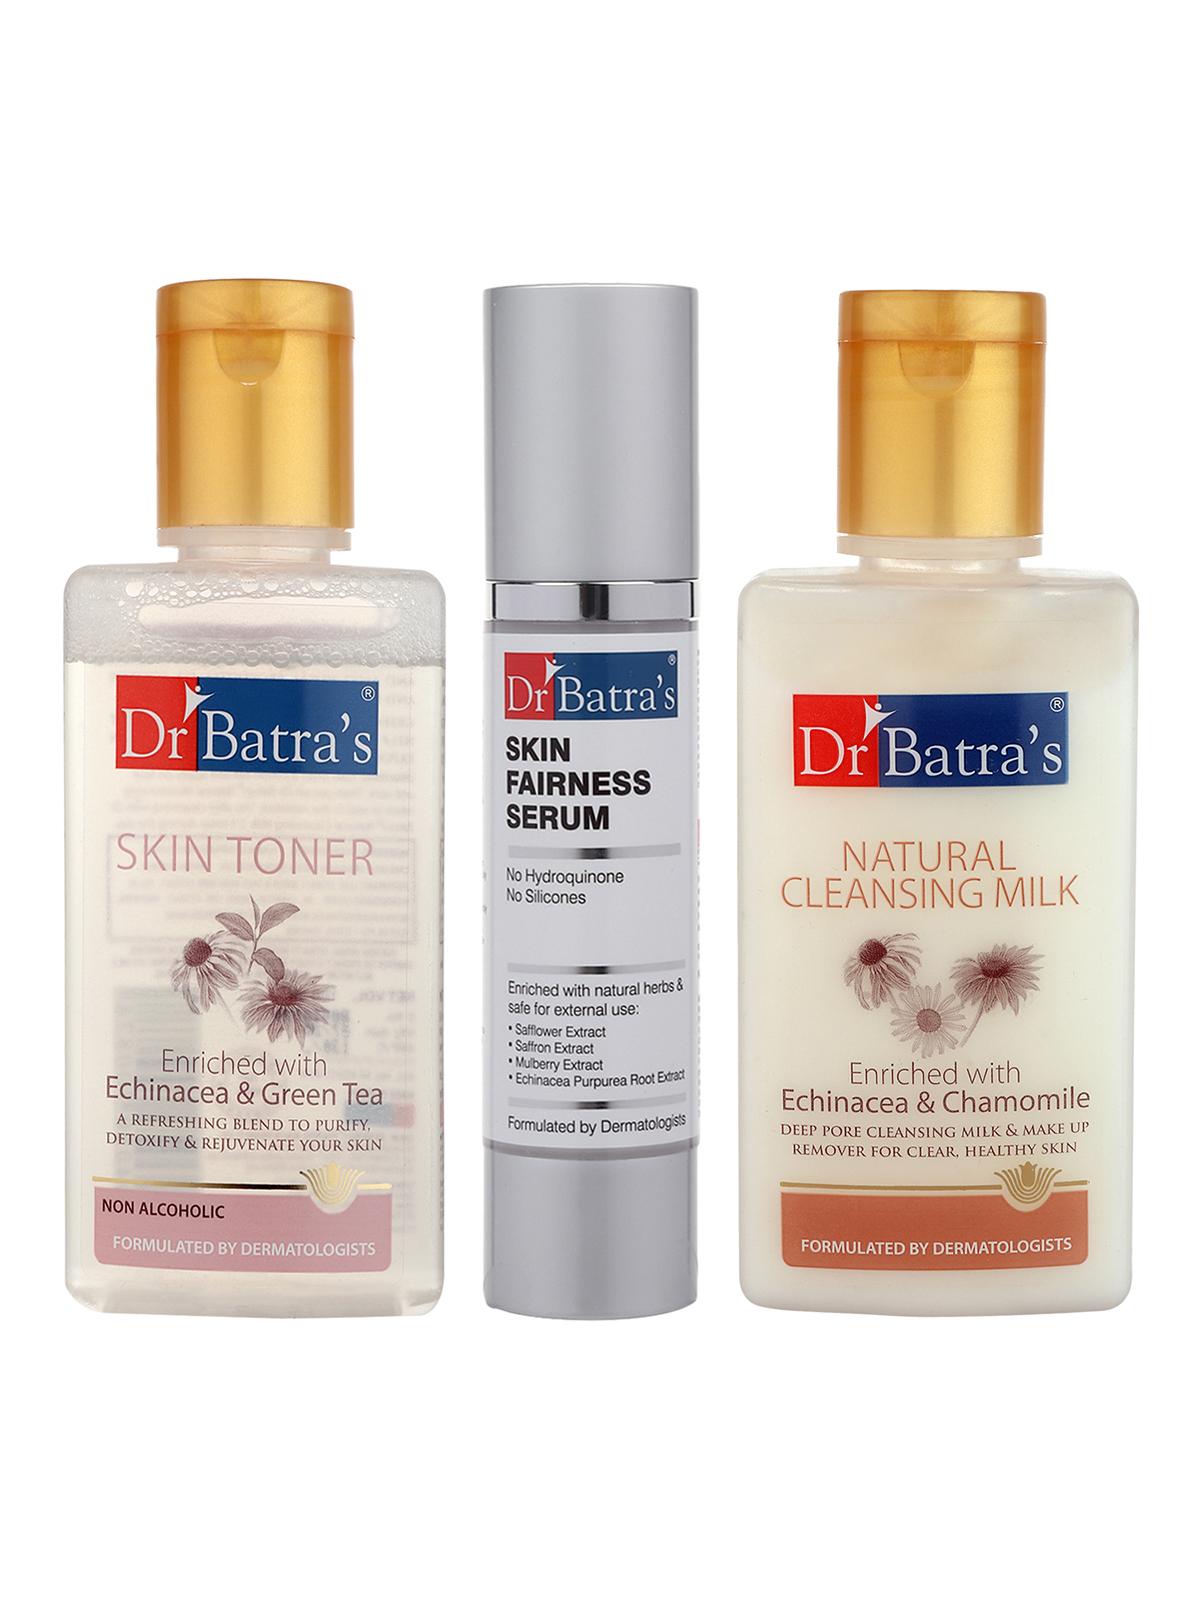 Dr Batra's | Dr Batra's Skin Toner - 100 ml, Natural Cleansing Milk - 100 ml and Skin Fairness Serum - 50 g (Pack of 3 for Men and Women)